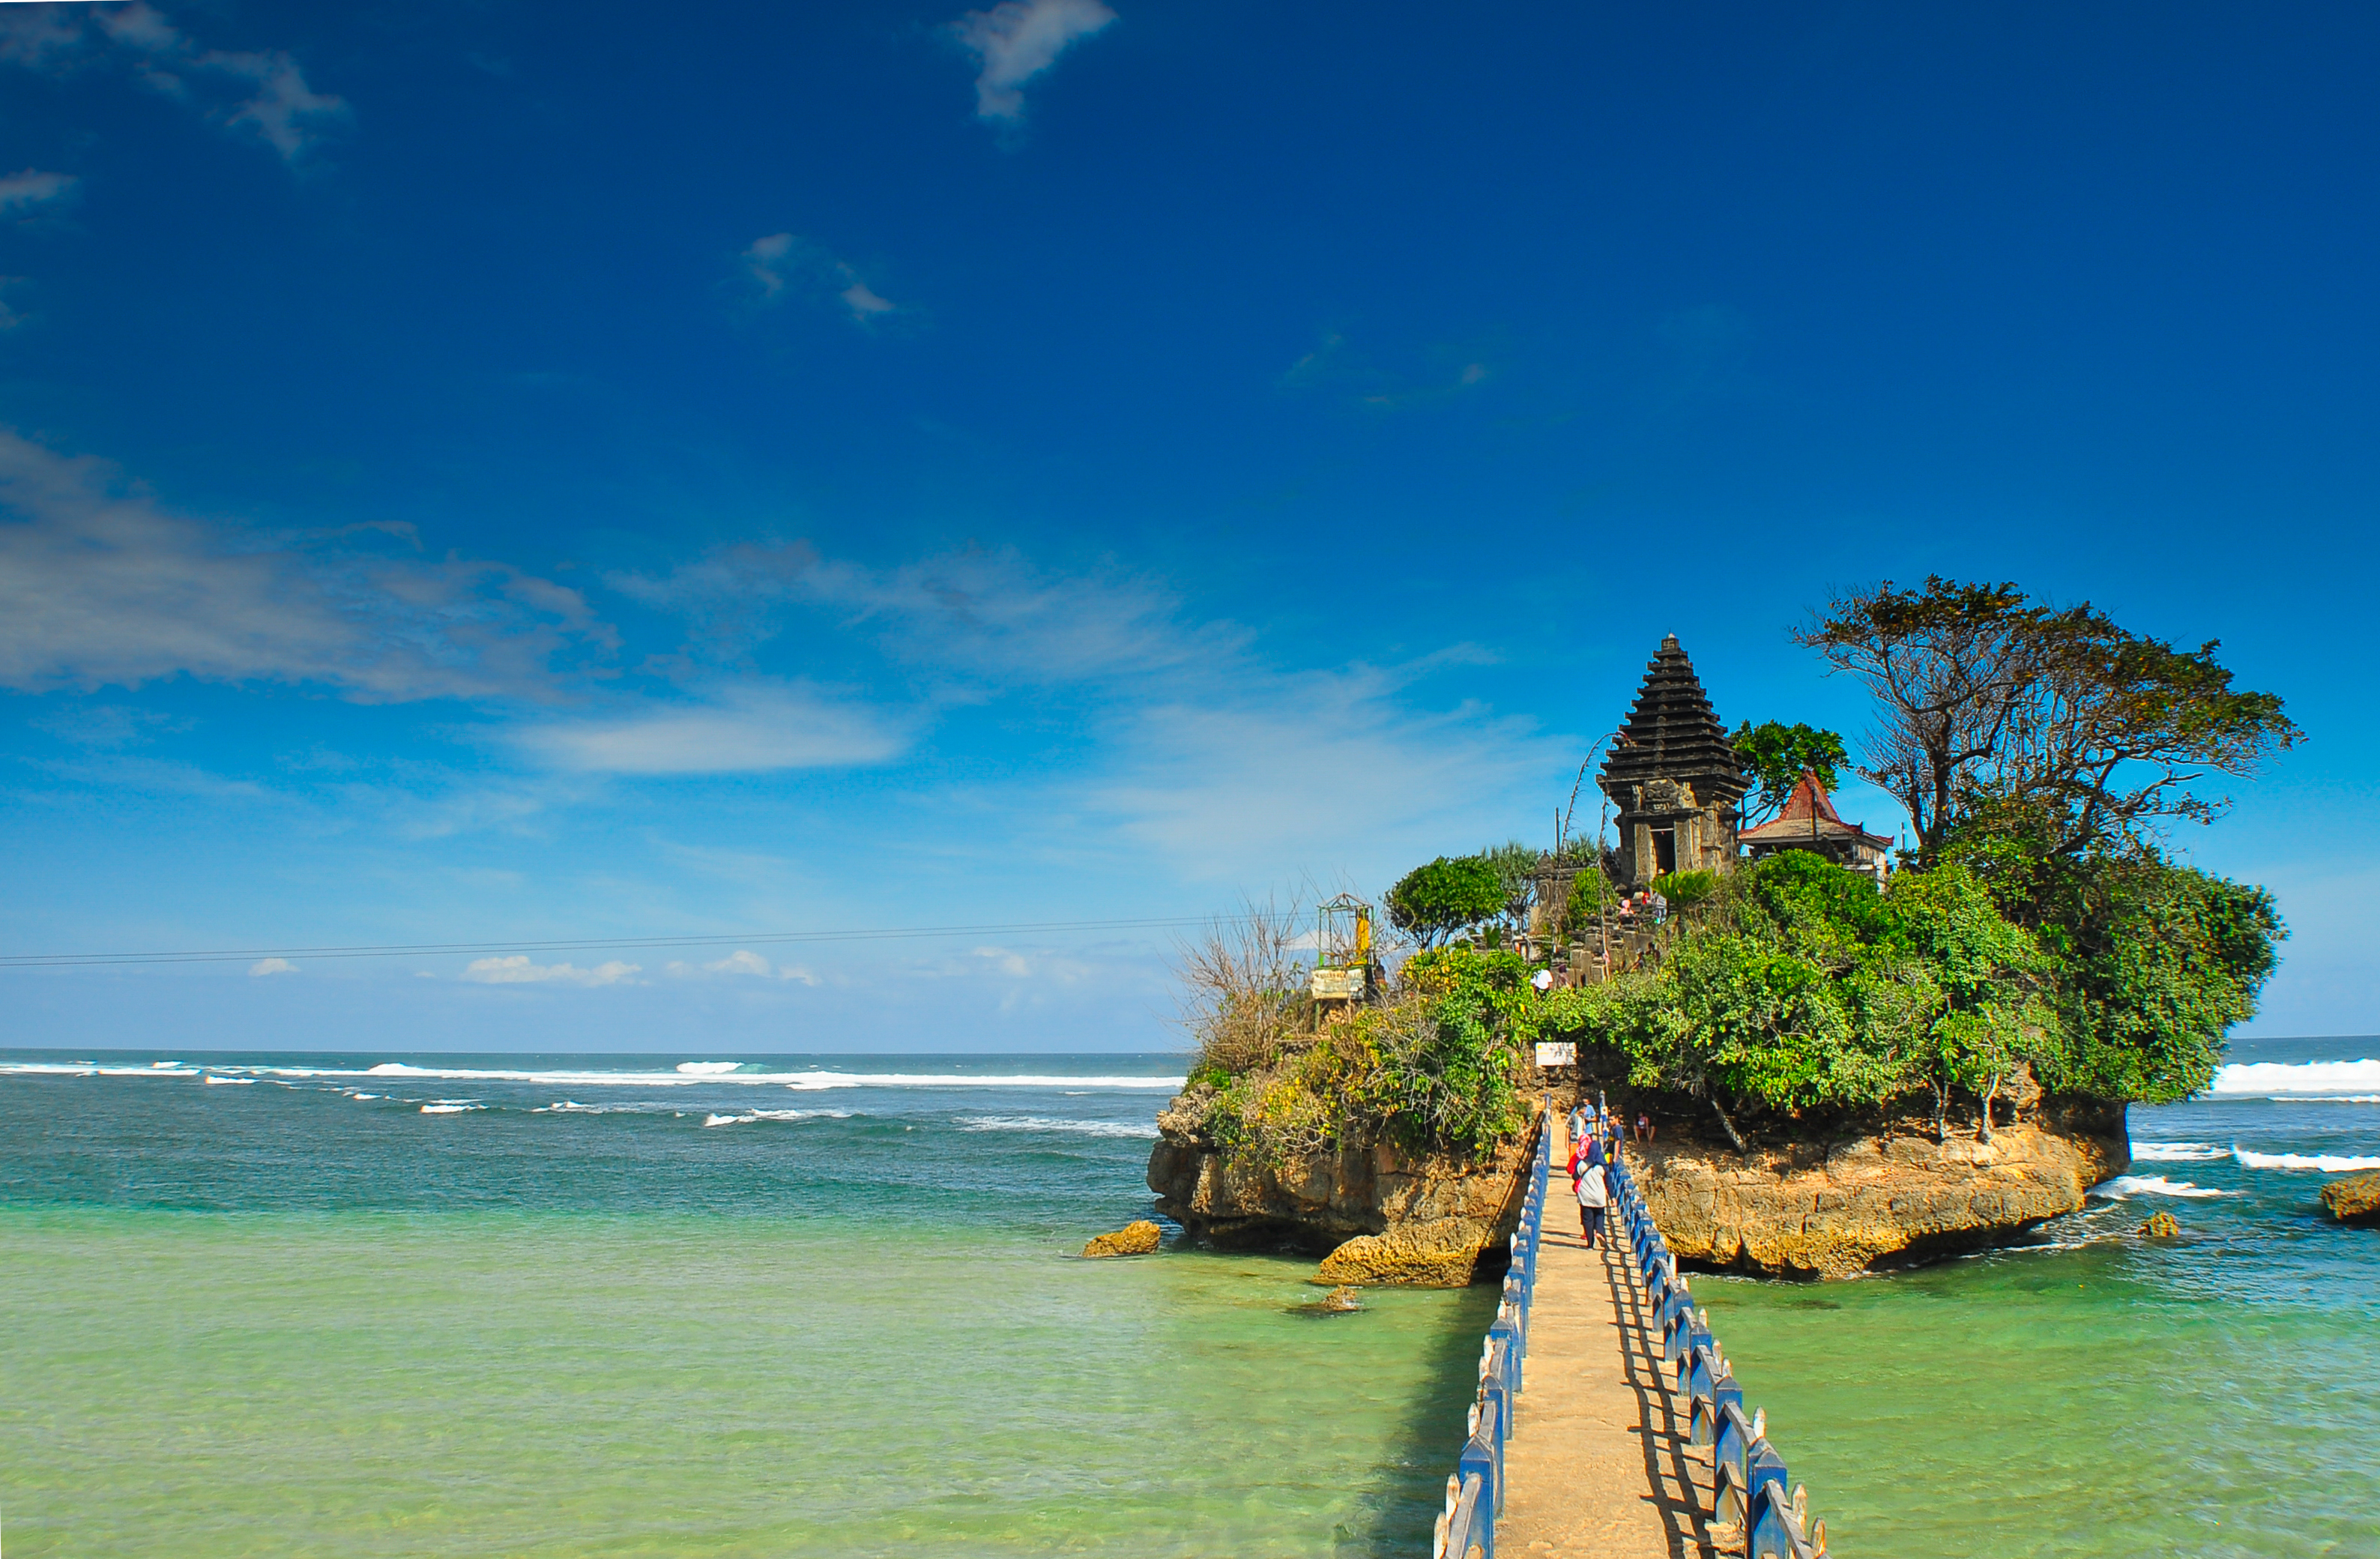 Pesona Pantai Balekambang Malang Tanah Lot Jawa Eksotis Kab